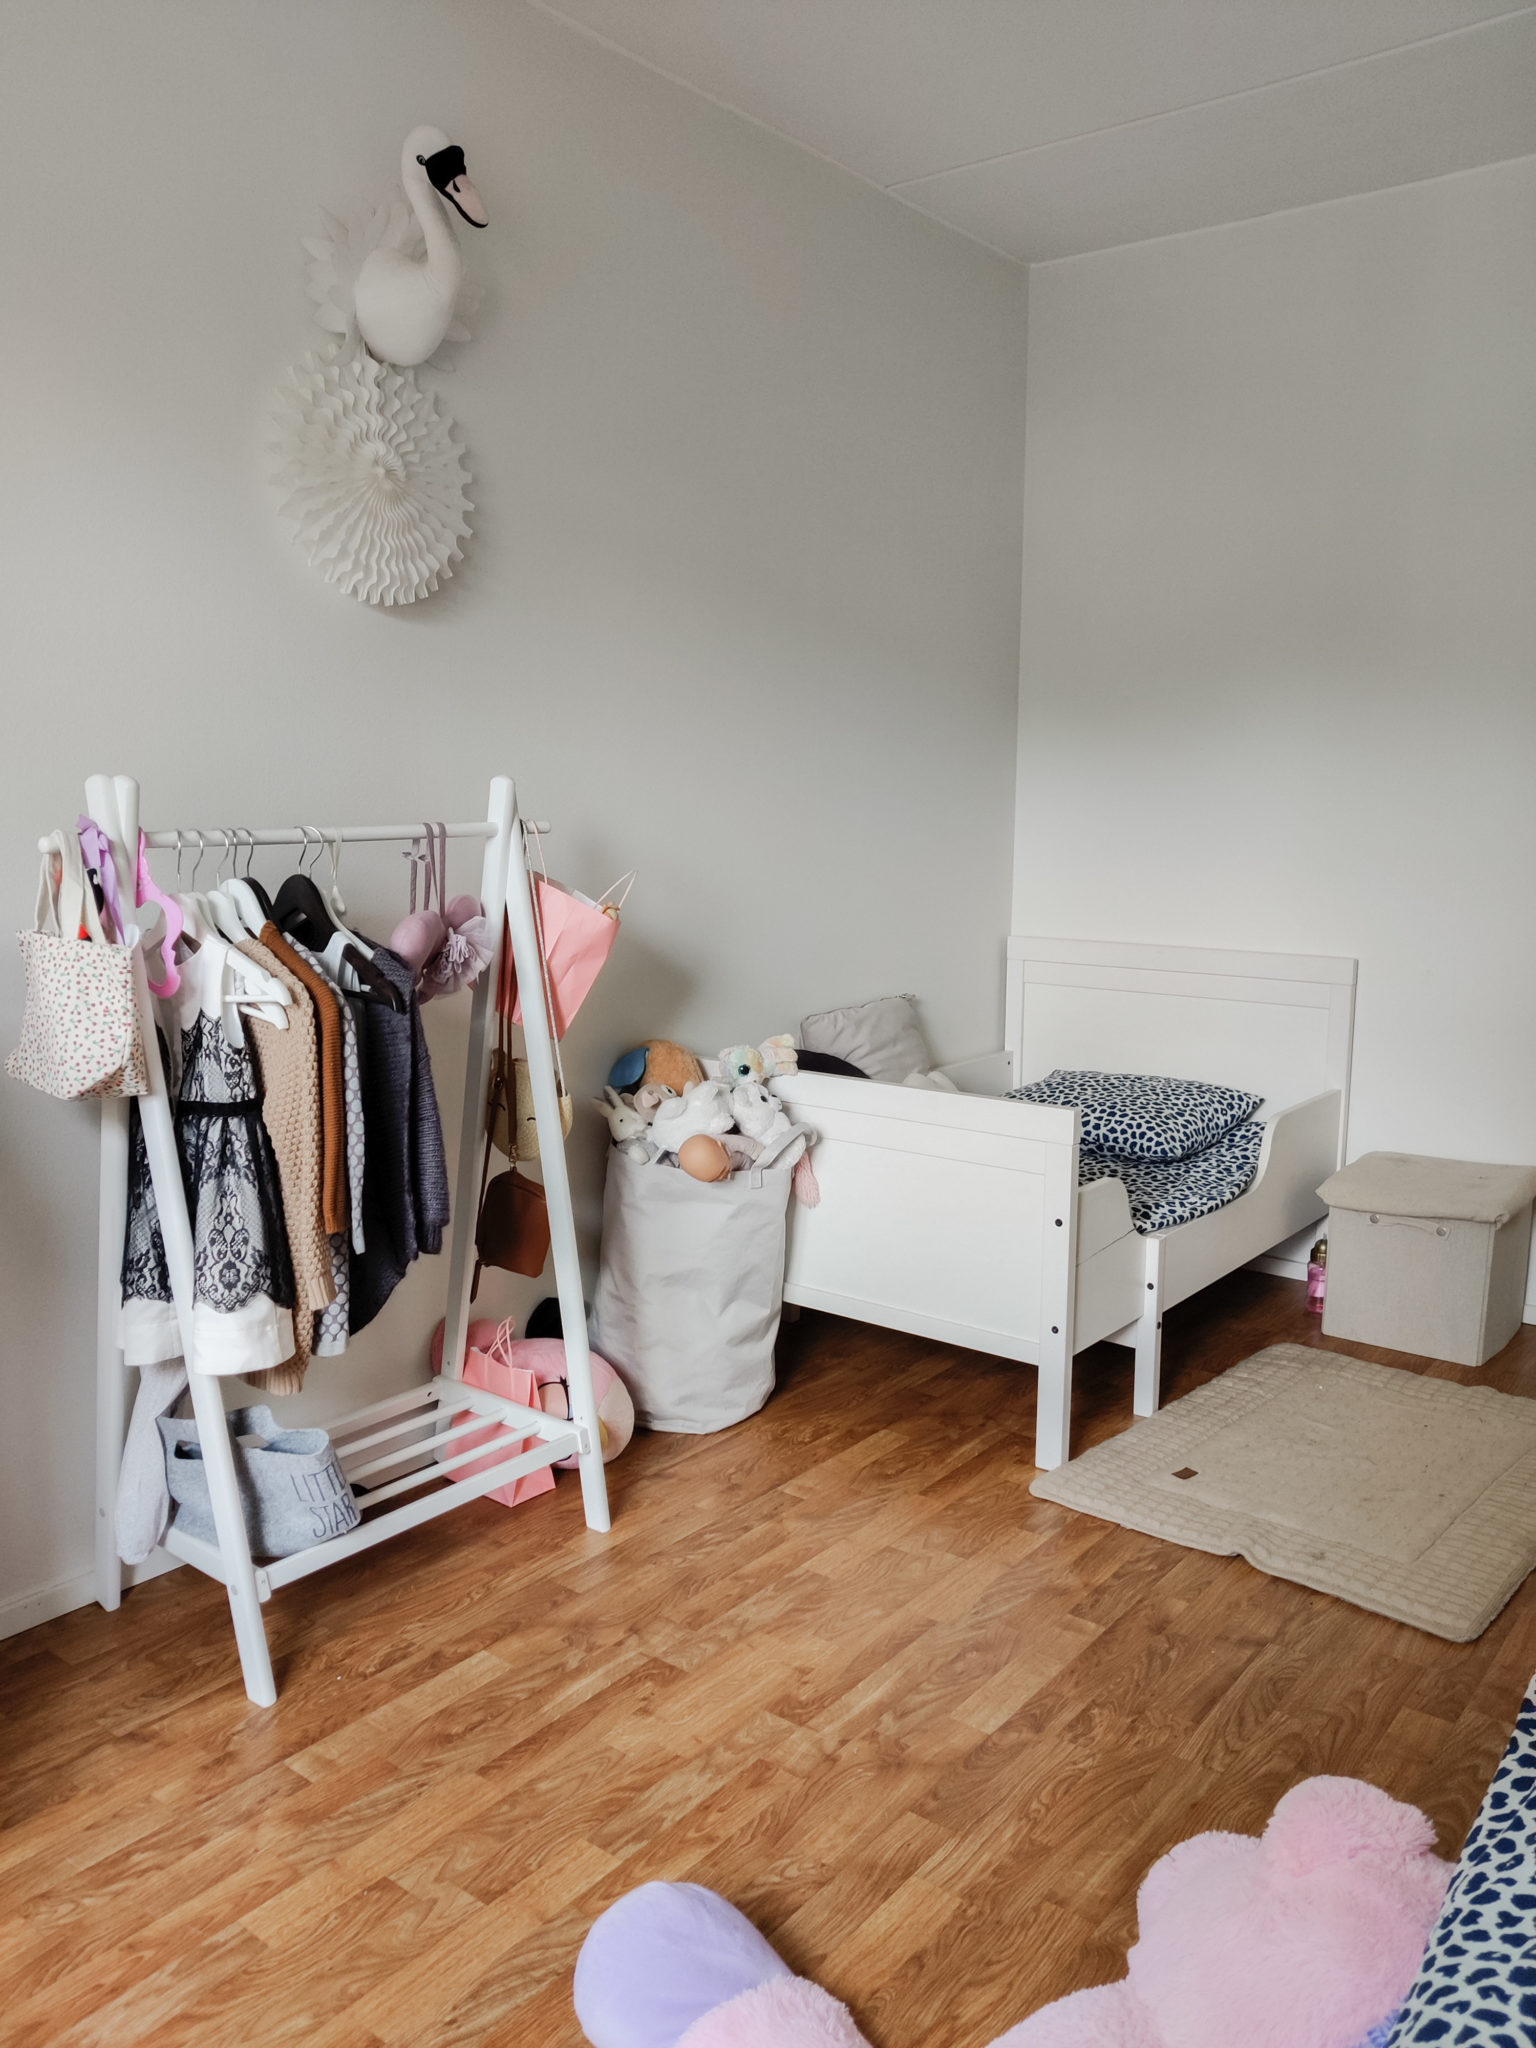 Lastenhuone - Sisustusblogi - BMH - Big mamas home by Jenni